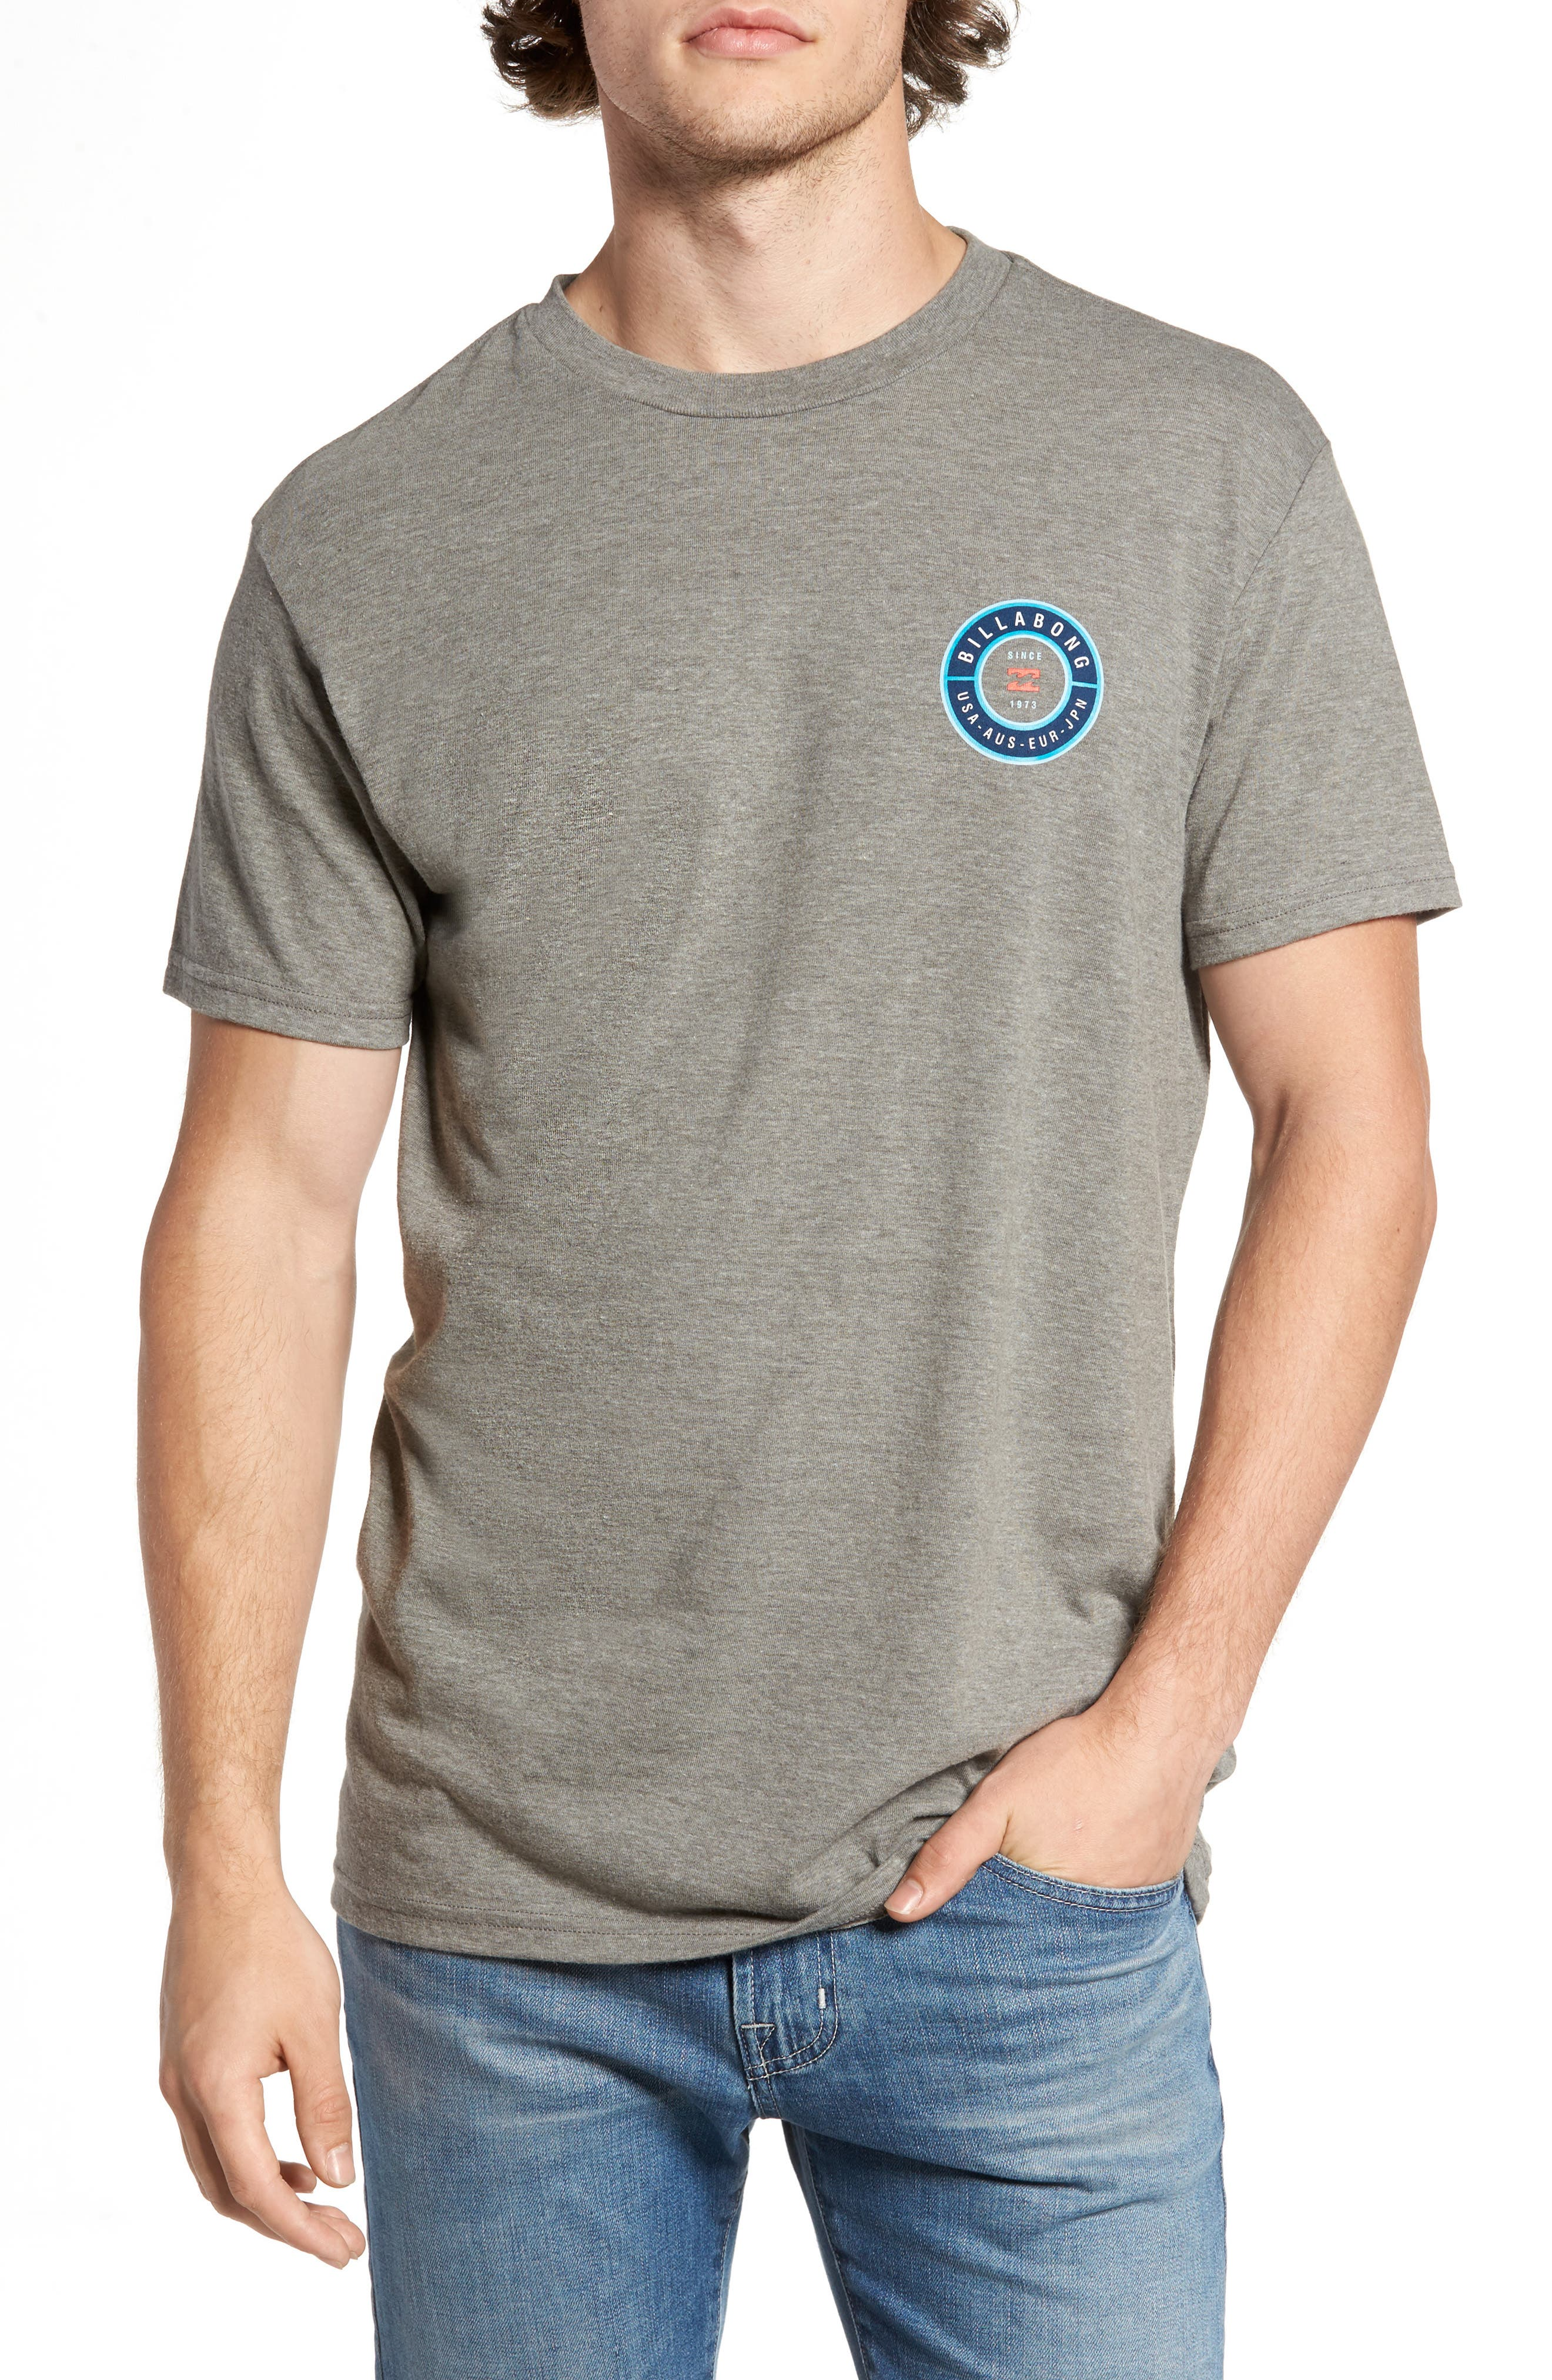 Rotor Graphic T-Shirt,                         Main,                         color, 025